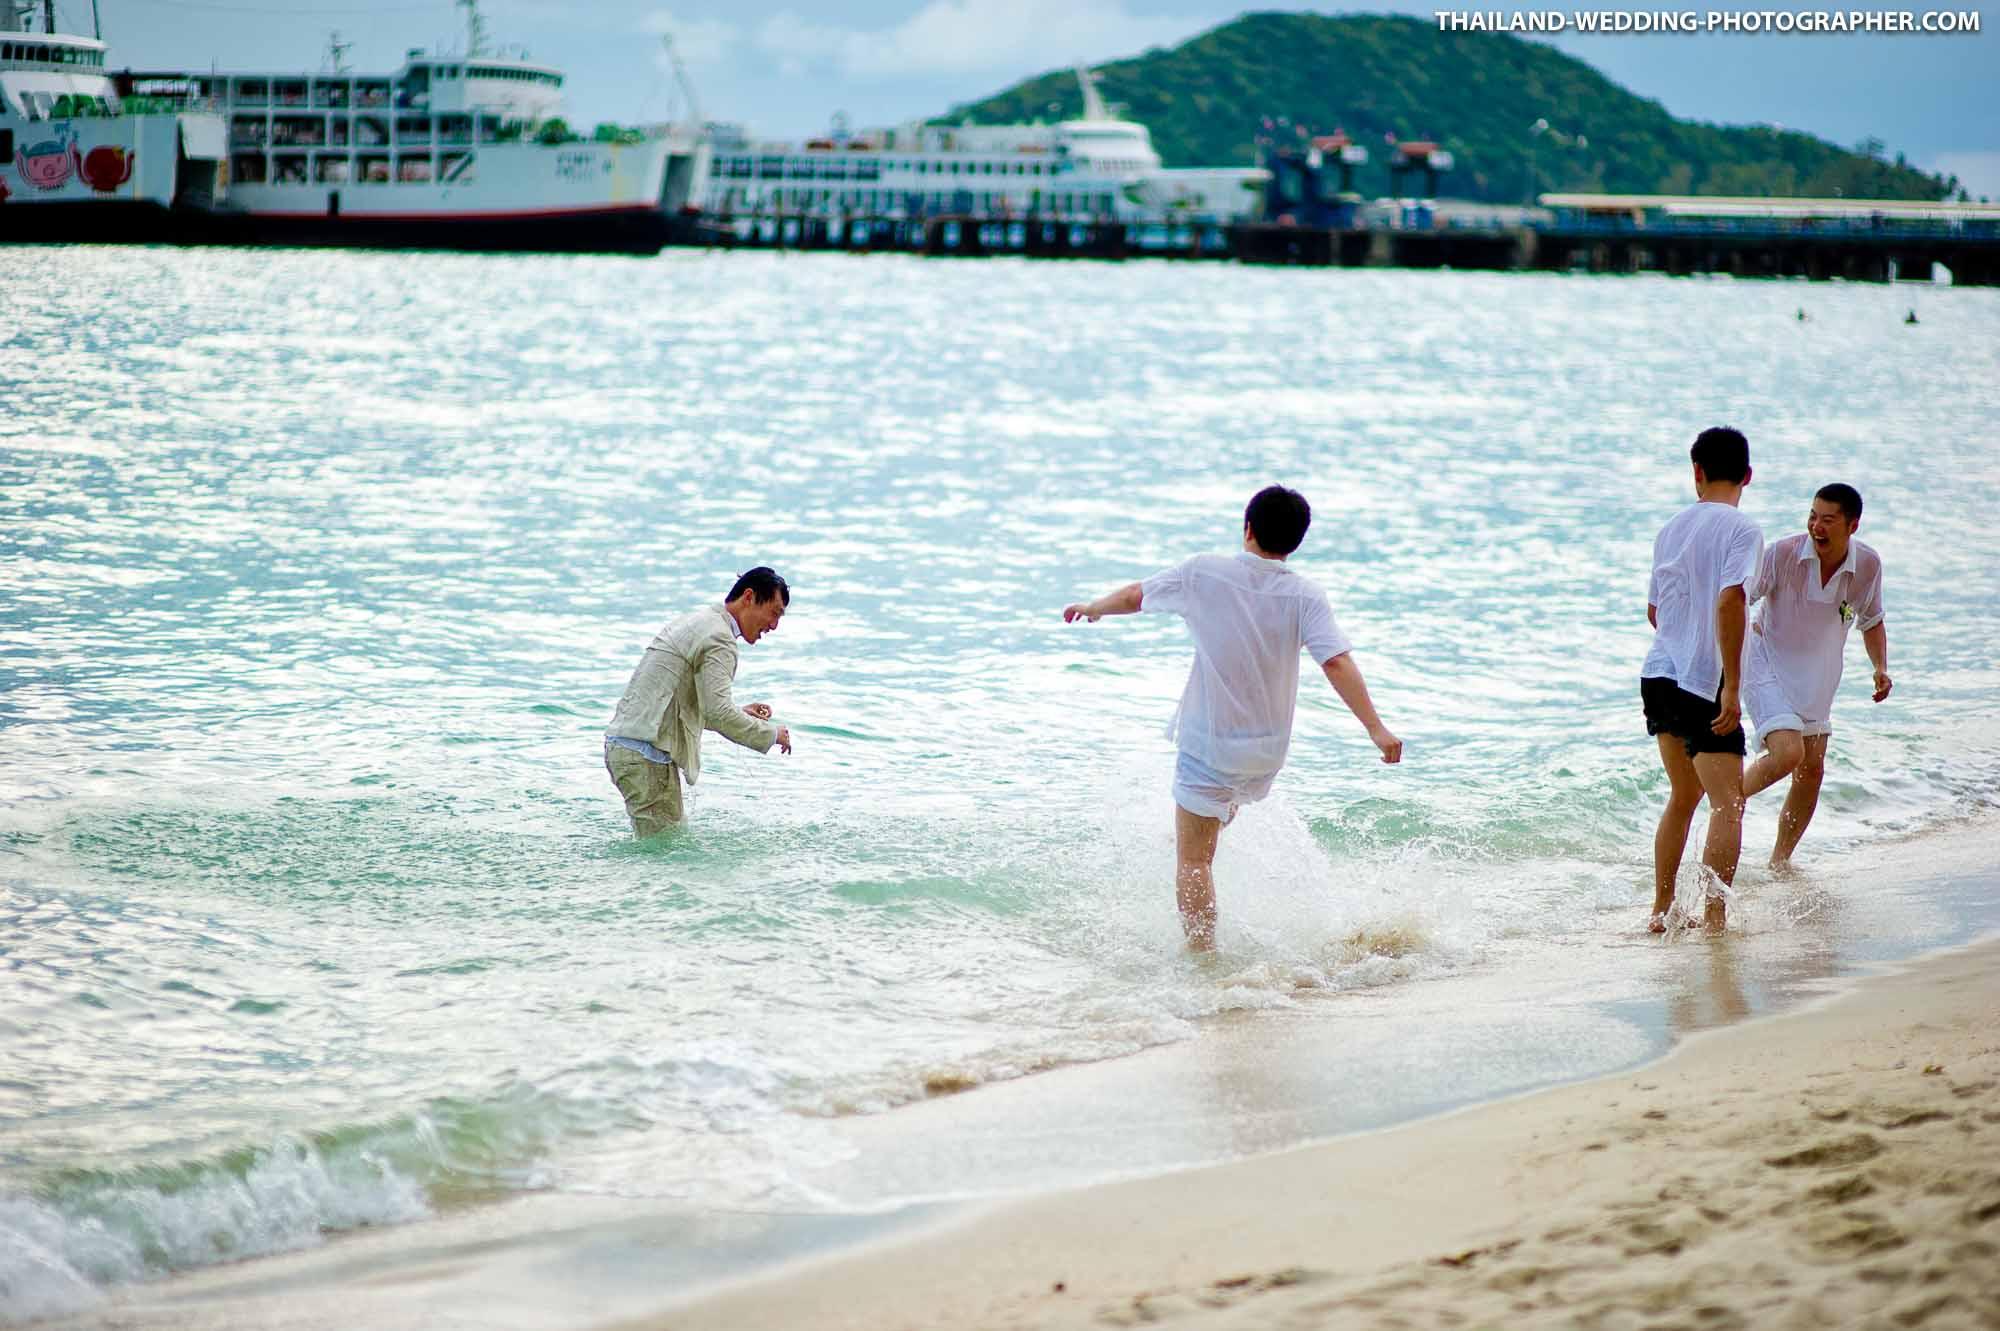 Dhevatara Cove (Baan Samlarn, Baan Rattana Thep Samui) Koh Samui Thailand Wedding Photography